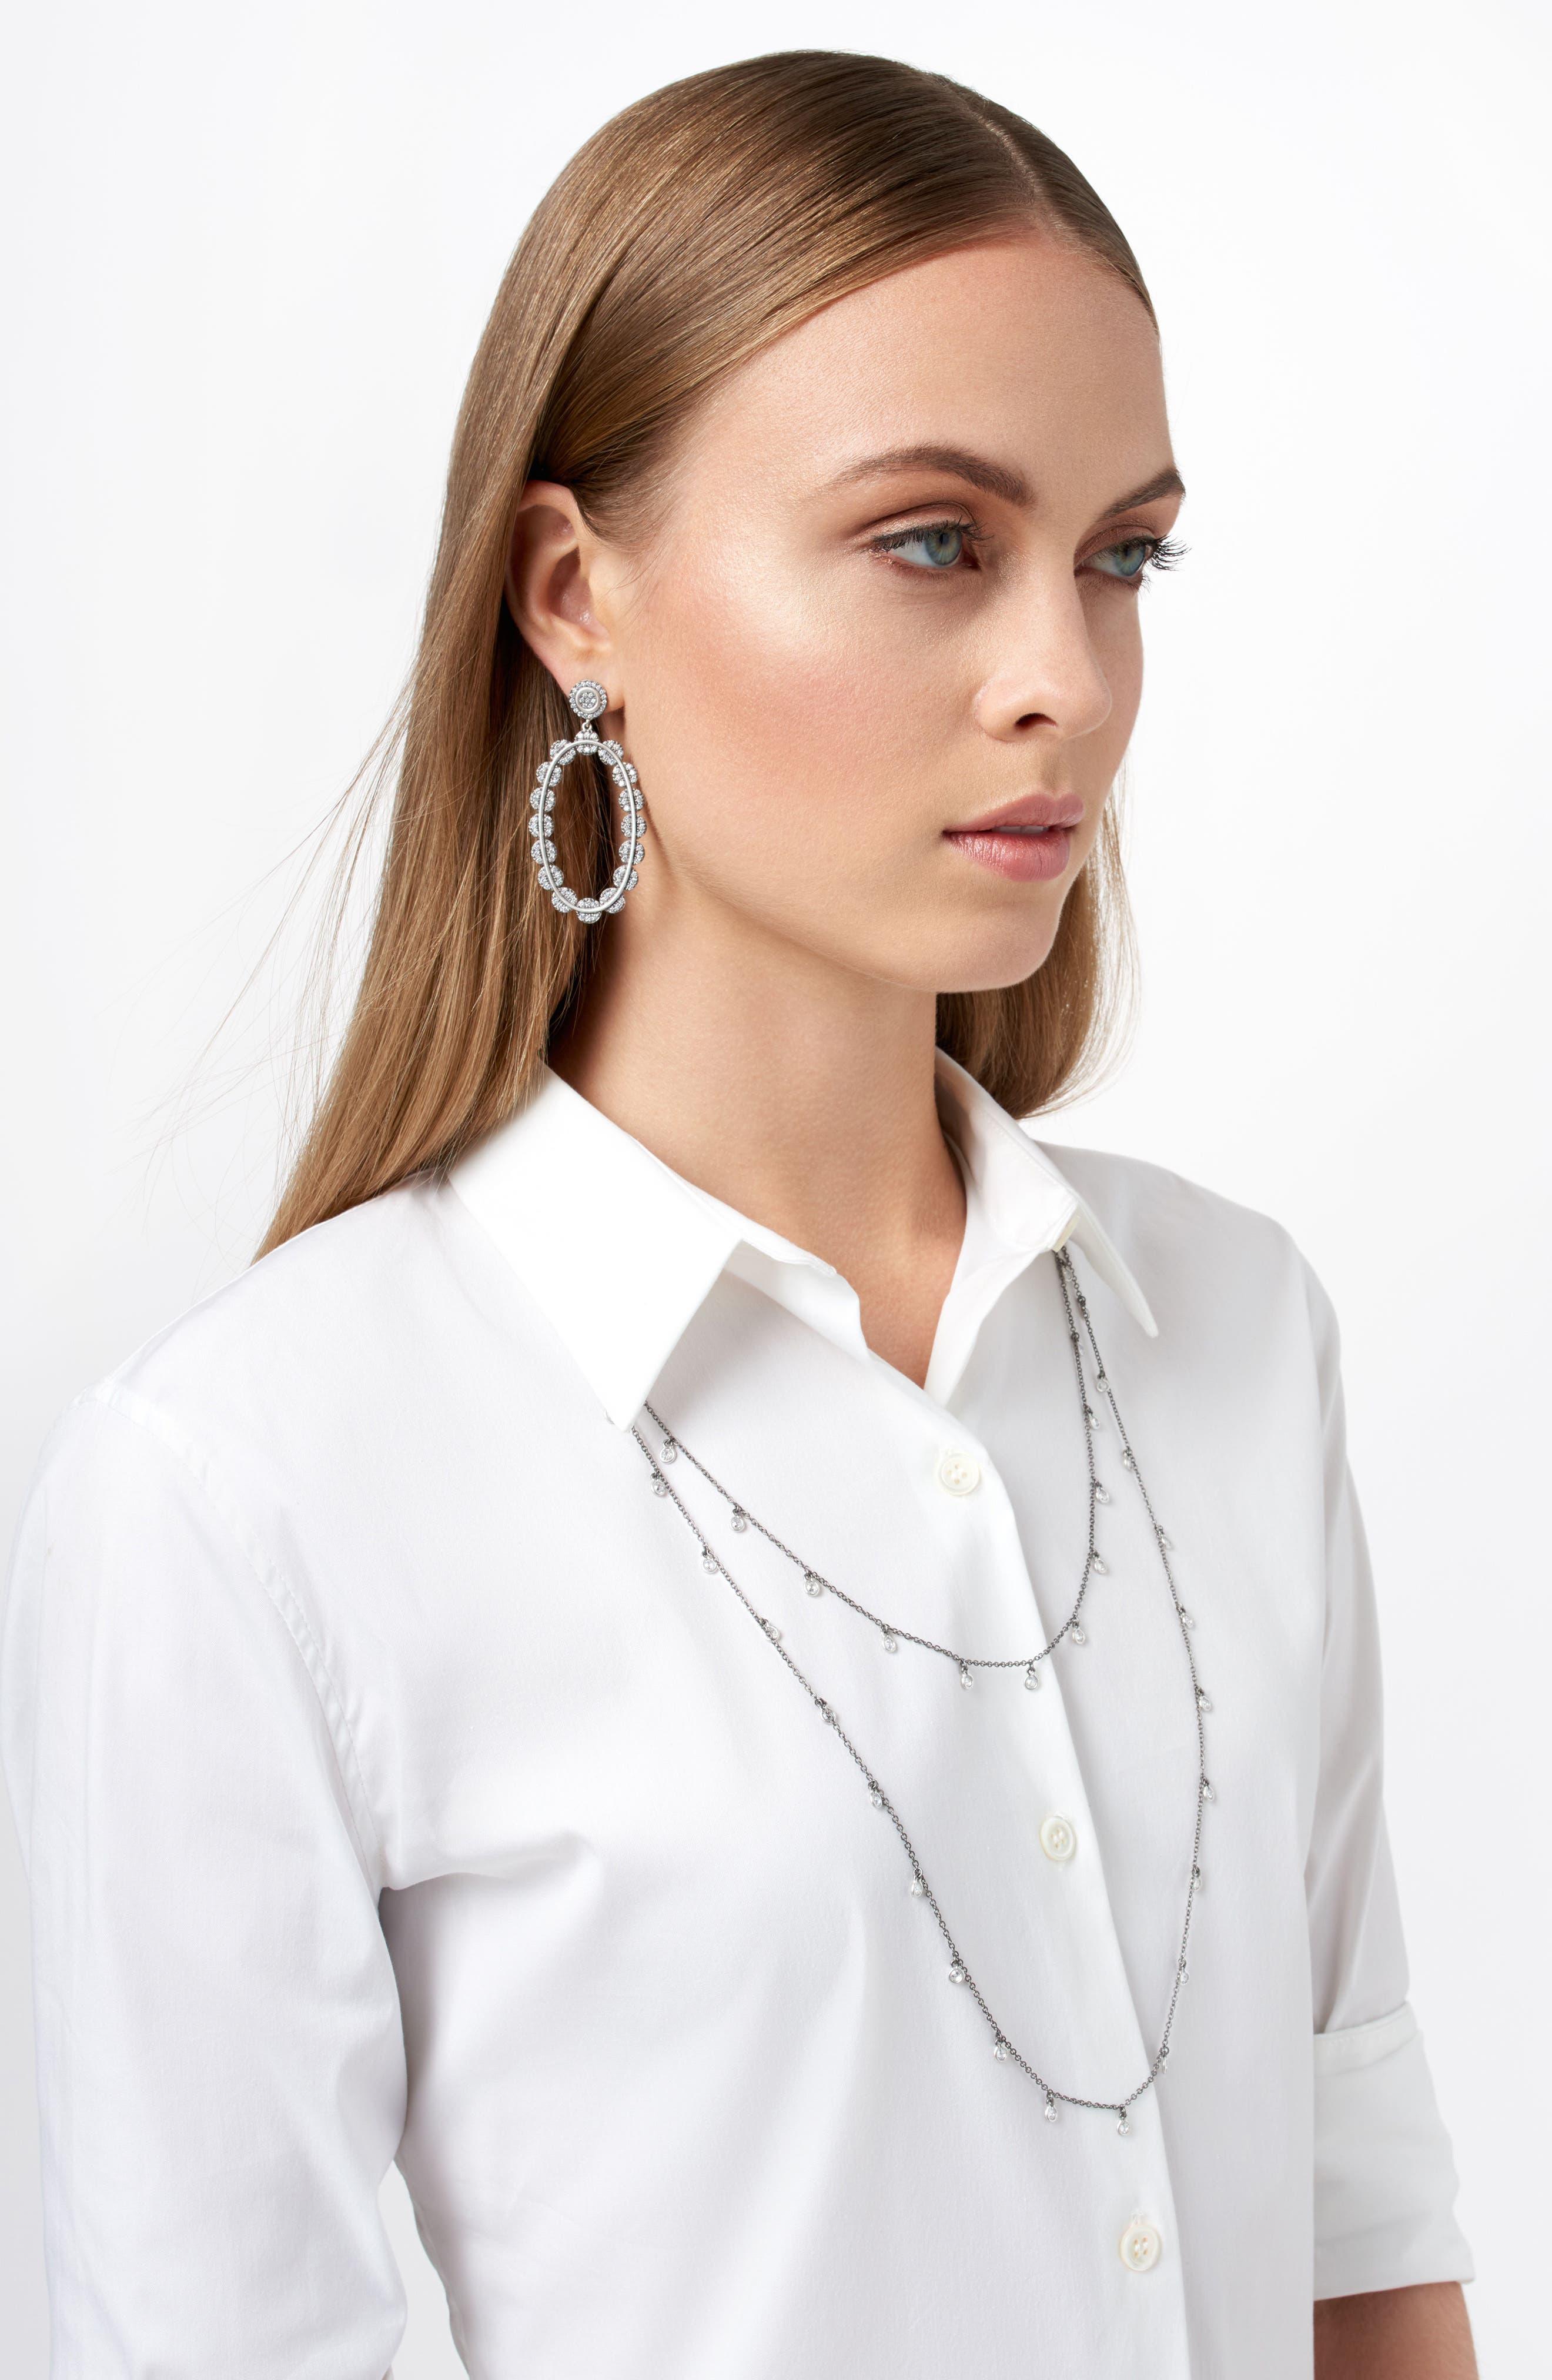 Cubic Zirconia Oval Drop Earrings,                             Alternate thumbnail 2, color,                             Black/ Silver